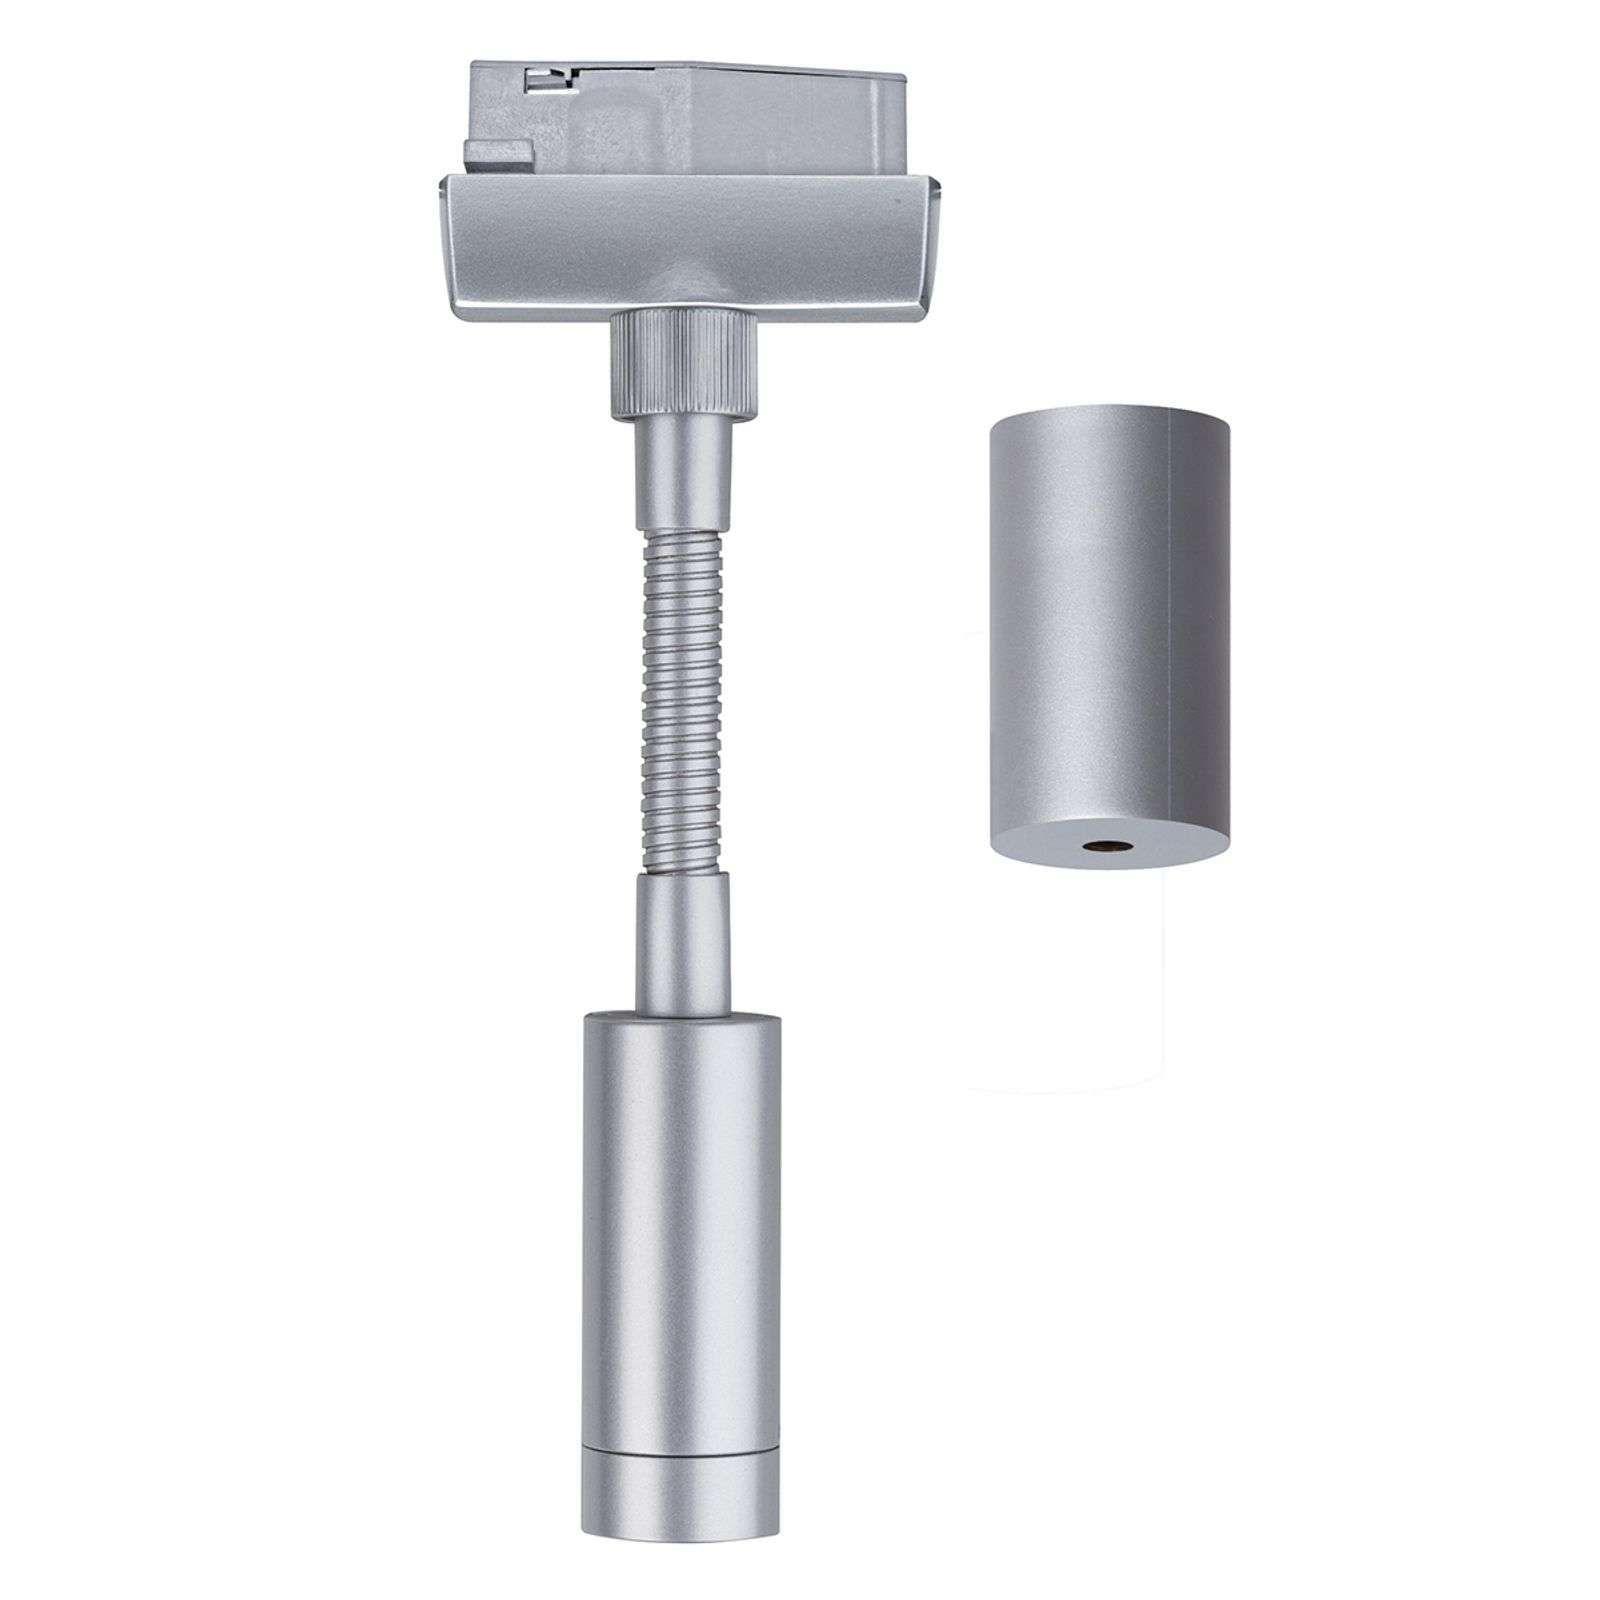 Paulmann Urail Slingeradapter Voor Railsysteem In 2020 Hanglamp Binnenverlichting Lampen24